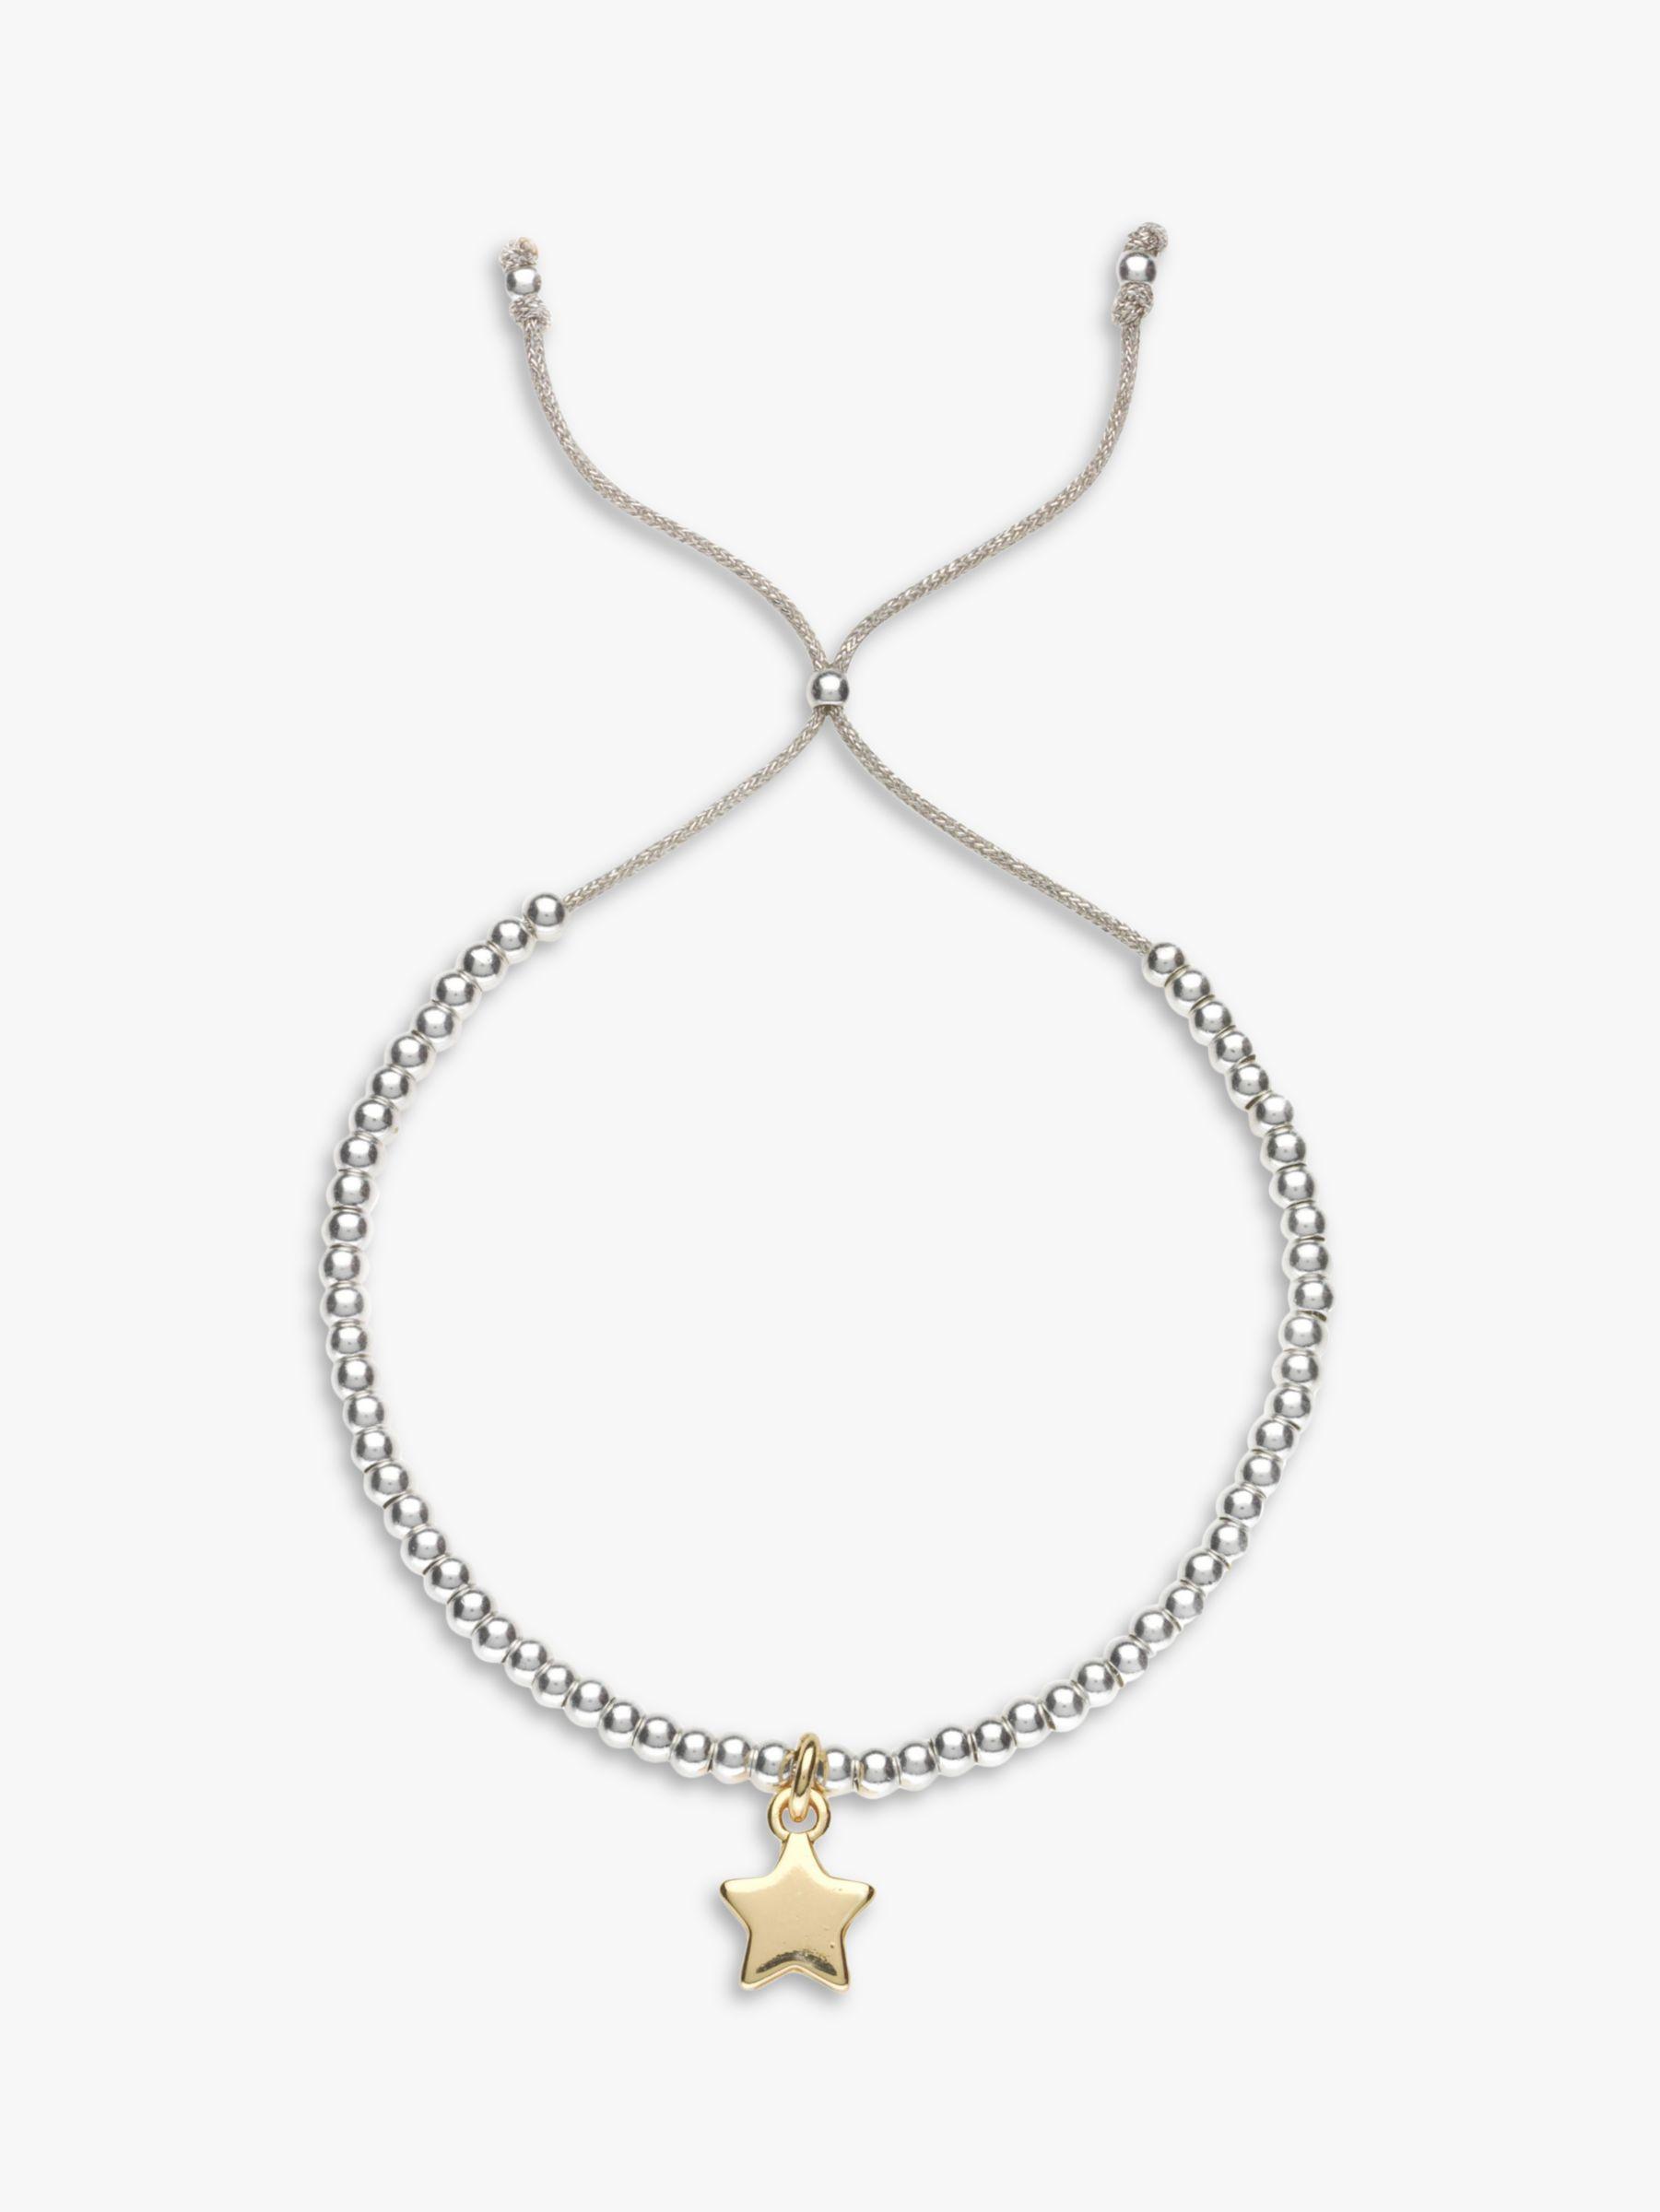 Estella Bartlett Estella Bartlett Liberty Beaded Star Bracelet, Silver/Gold